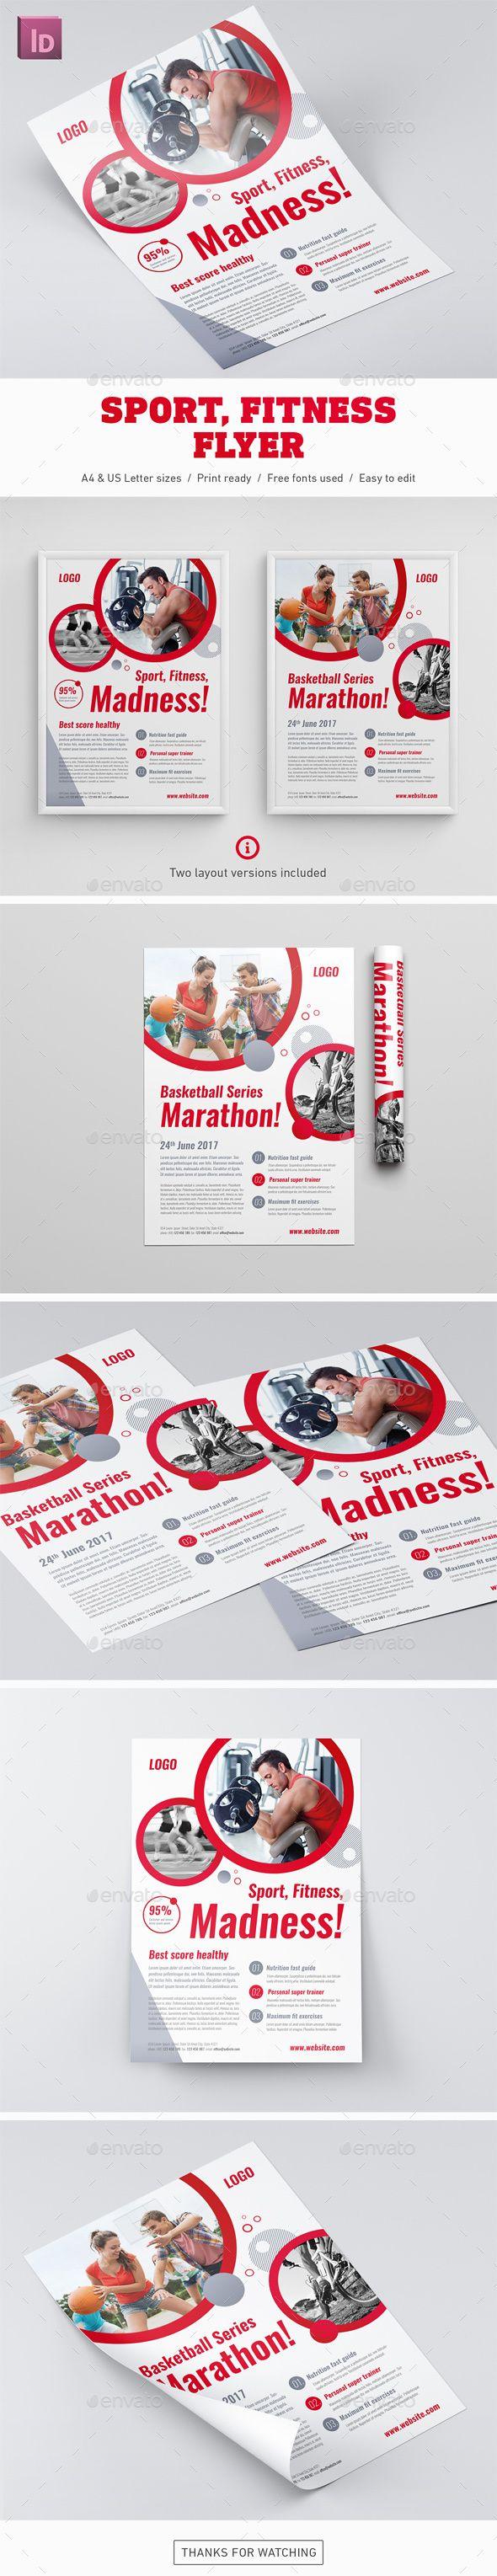 Sport Fitness Flyer Template InDesign INDD